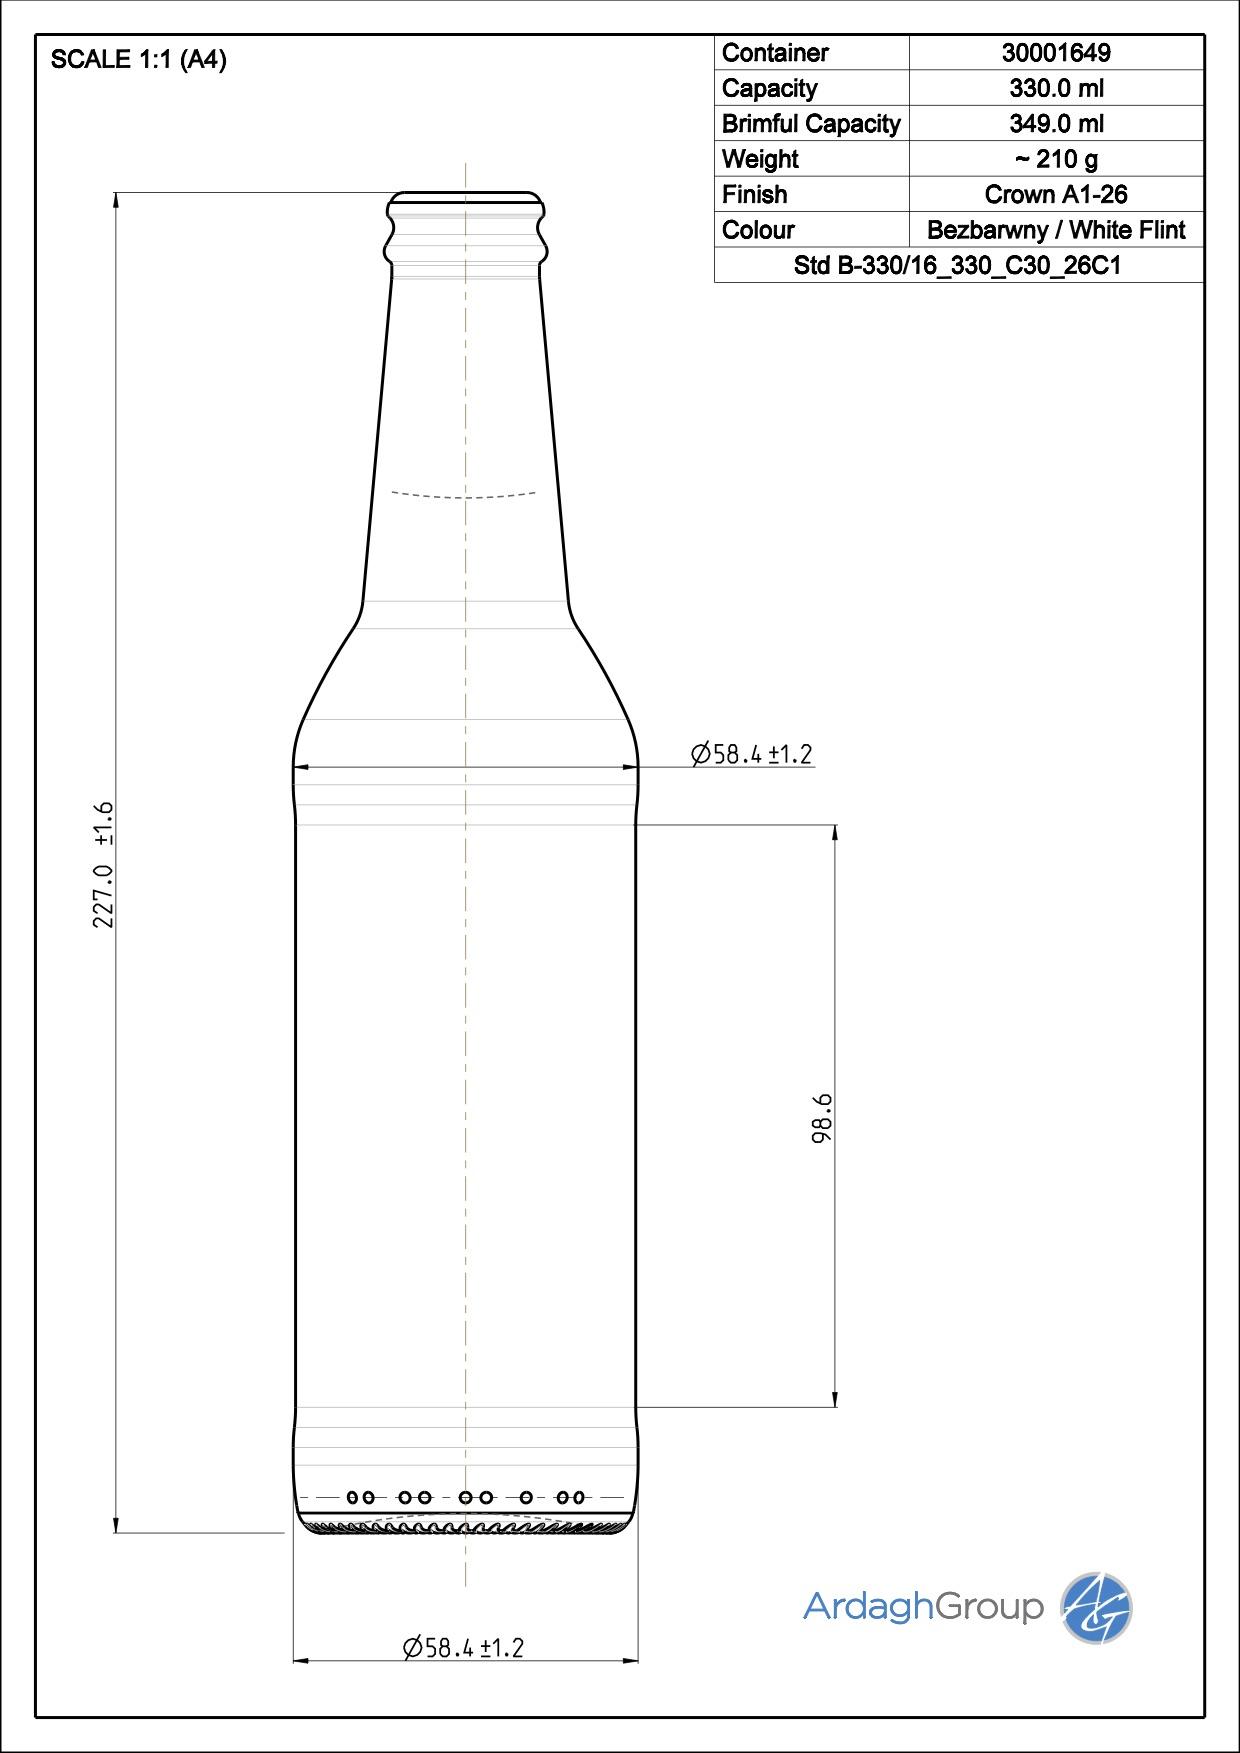 Std B-330/16 330 C30 26C1